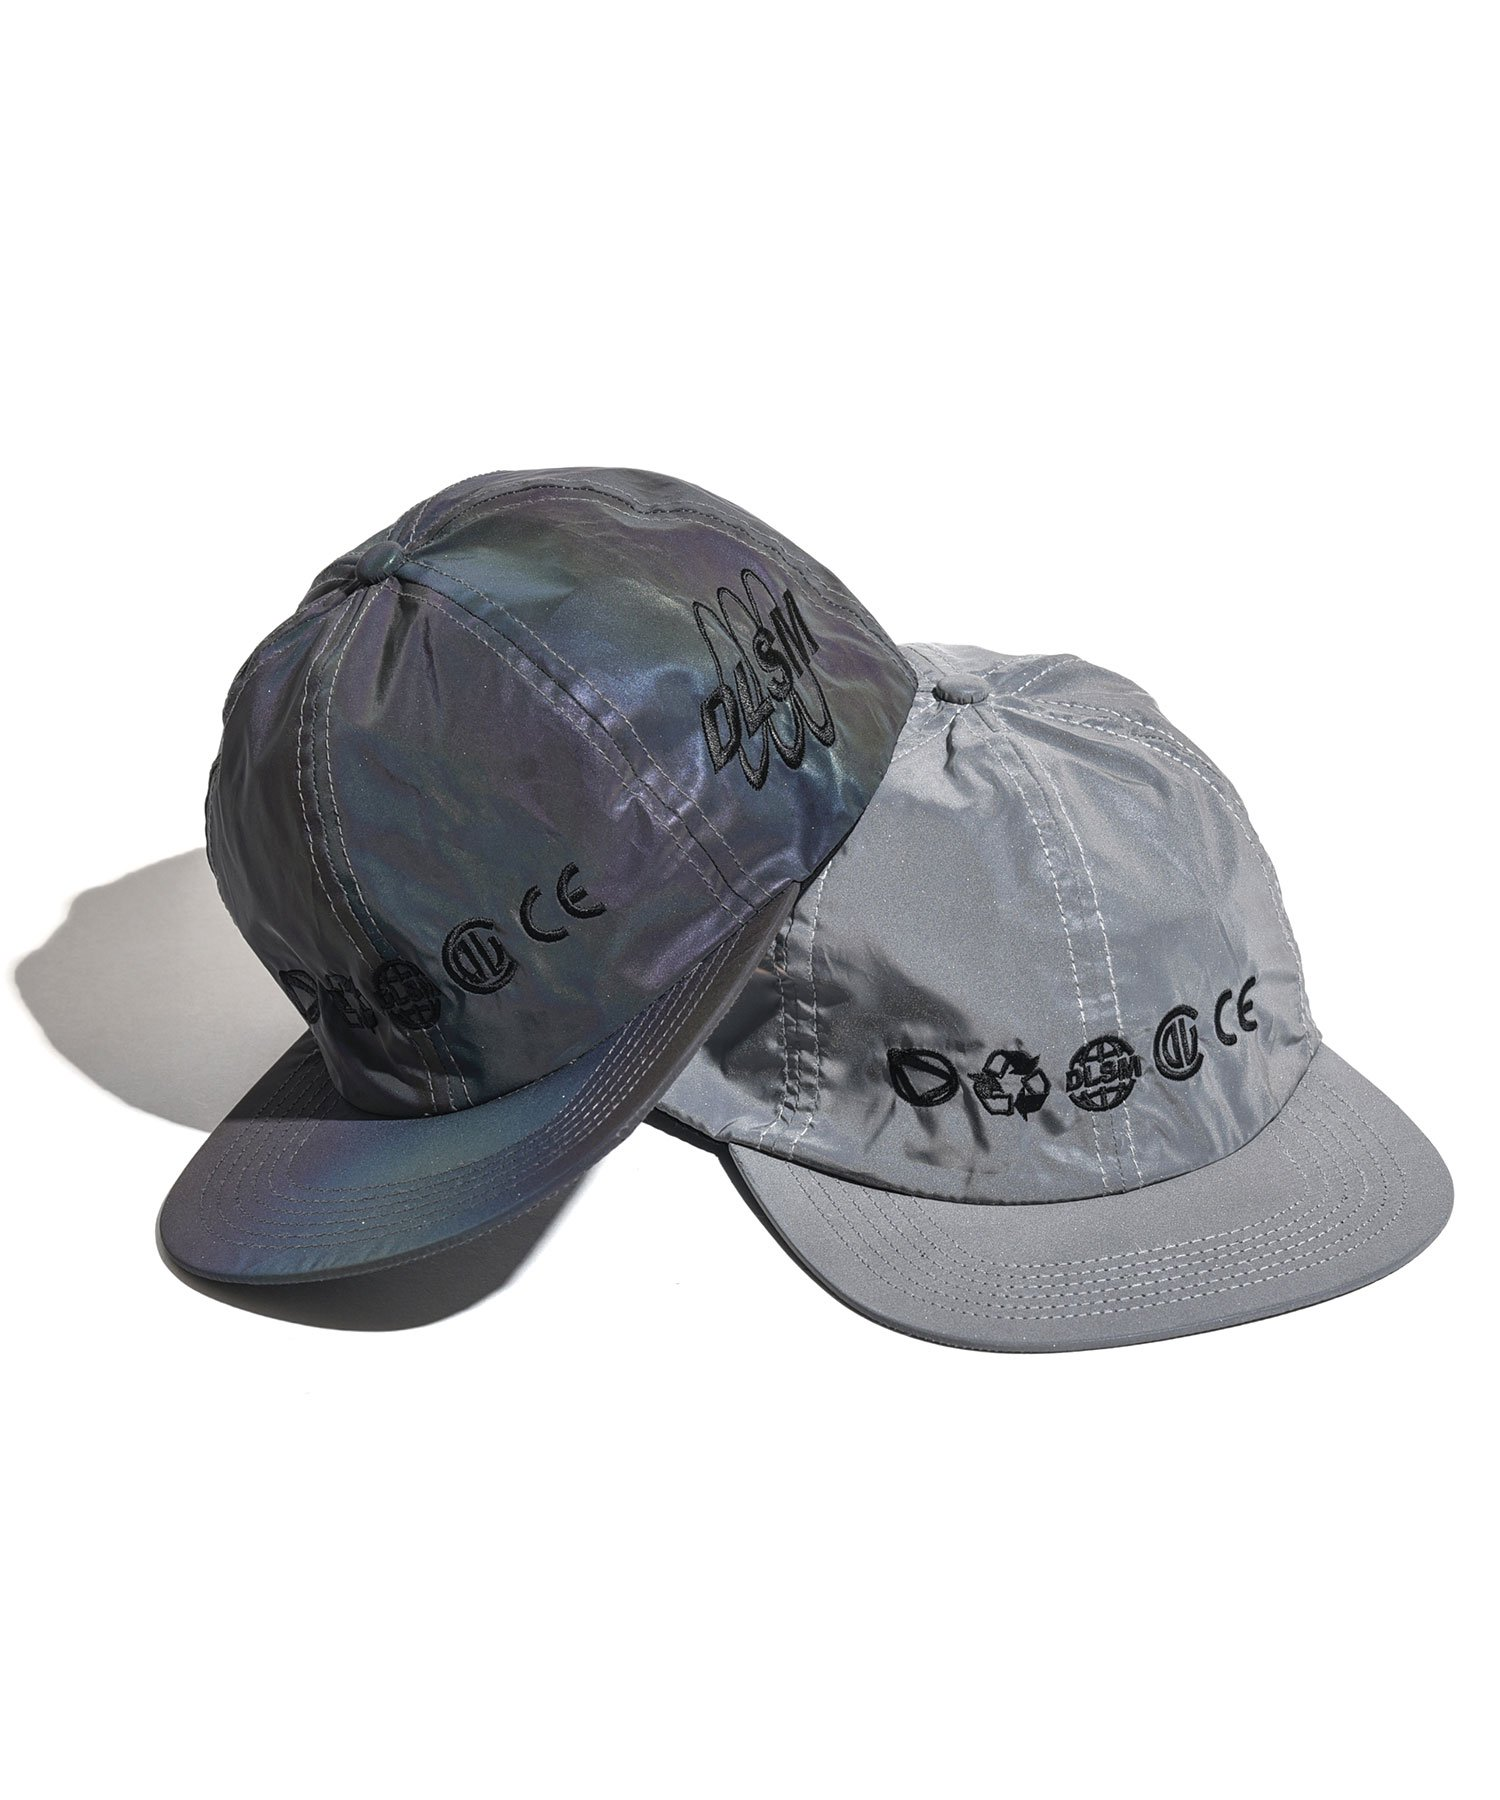 FUTURE LOGO REFLECT CAP